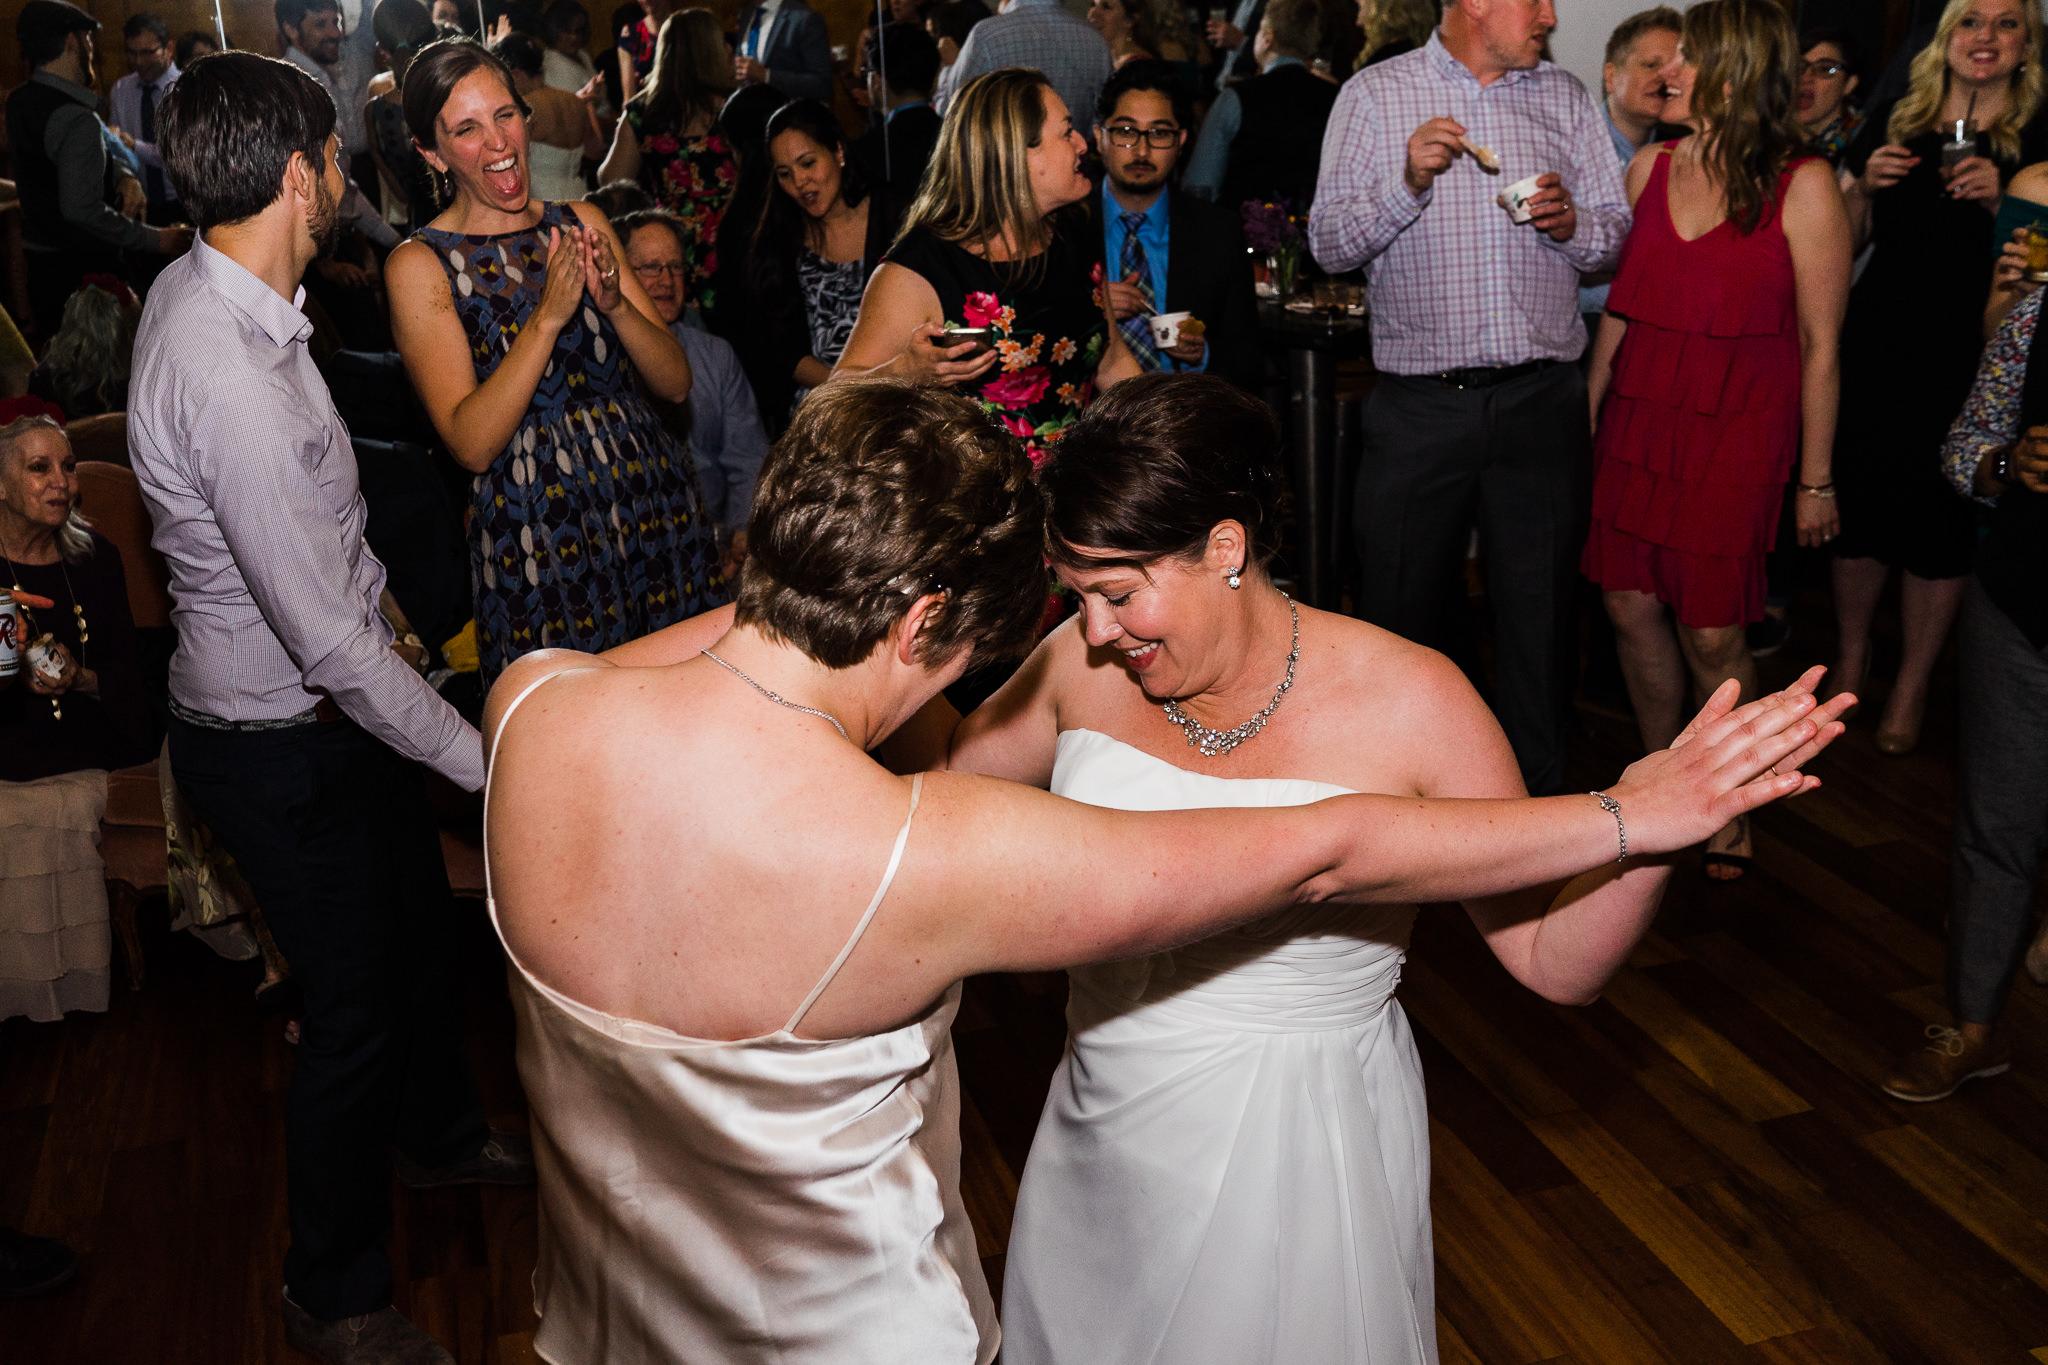 Bride dress gown Reception Party